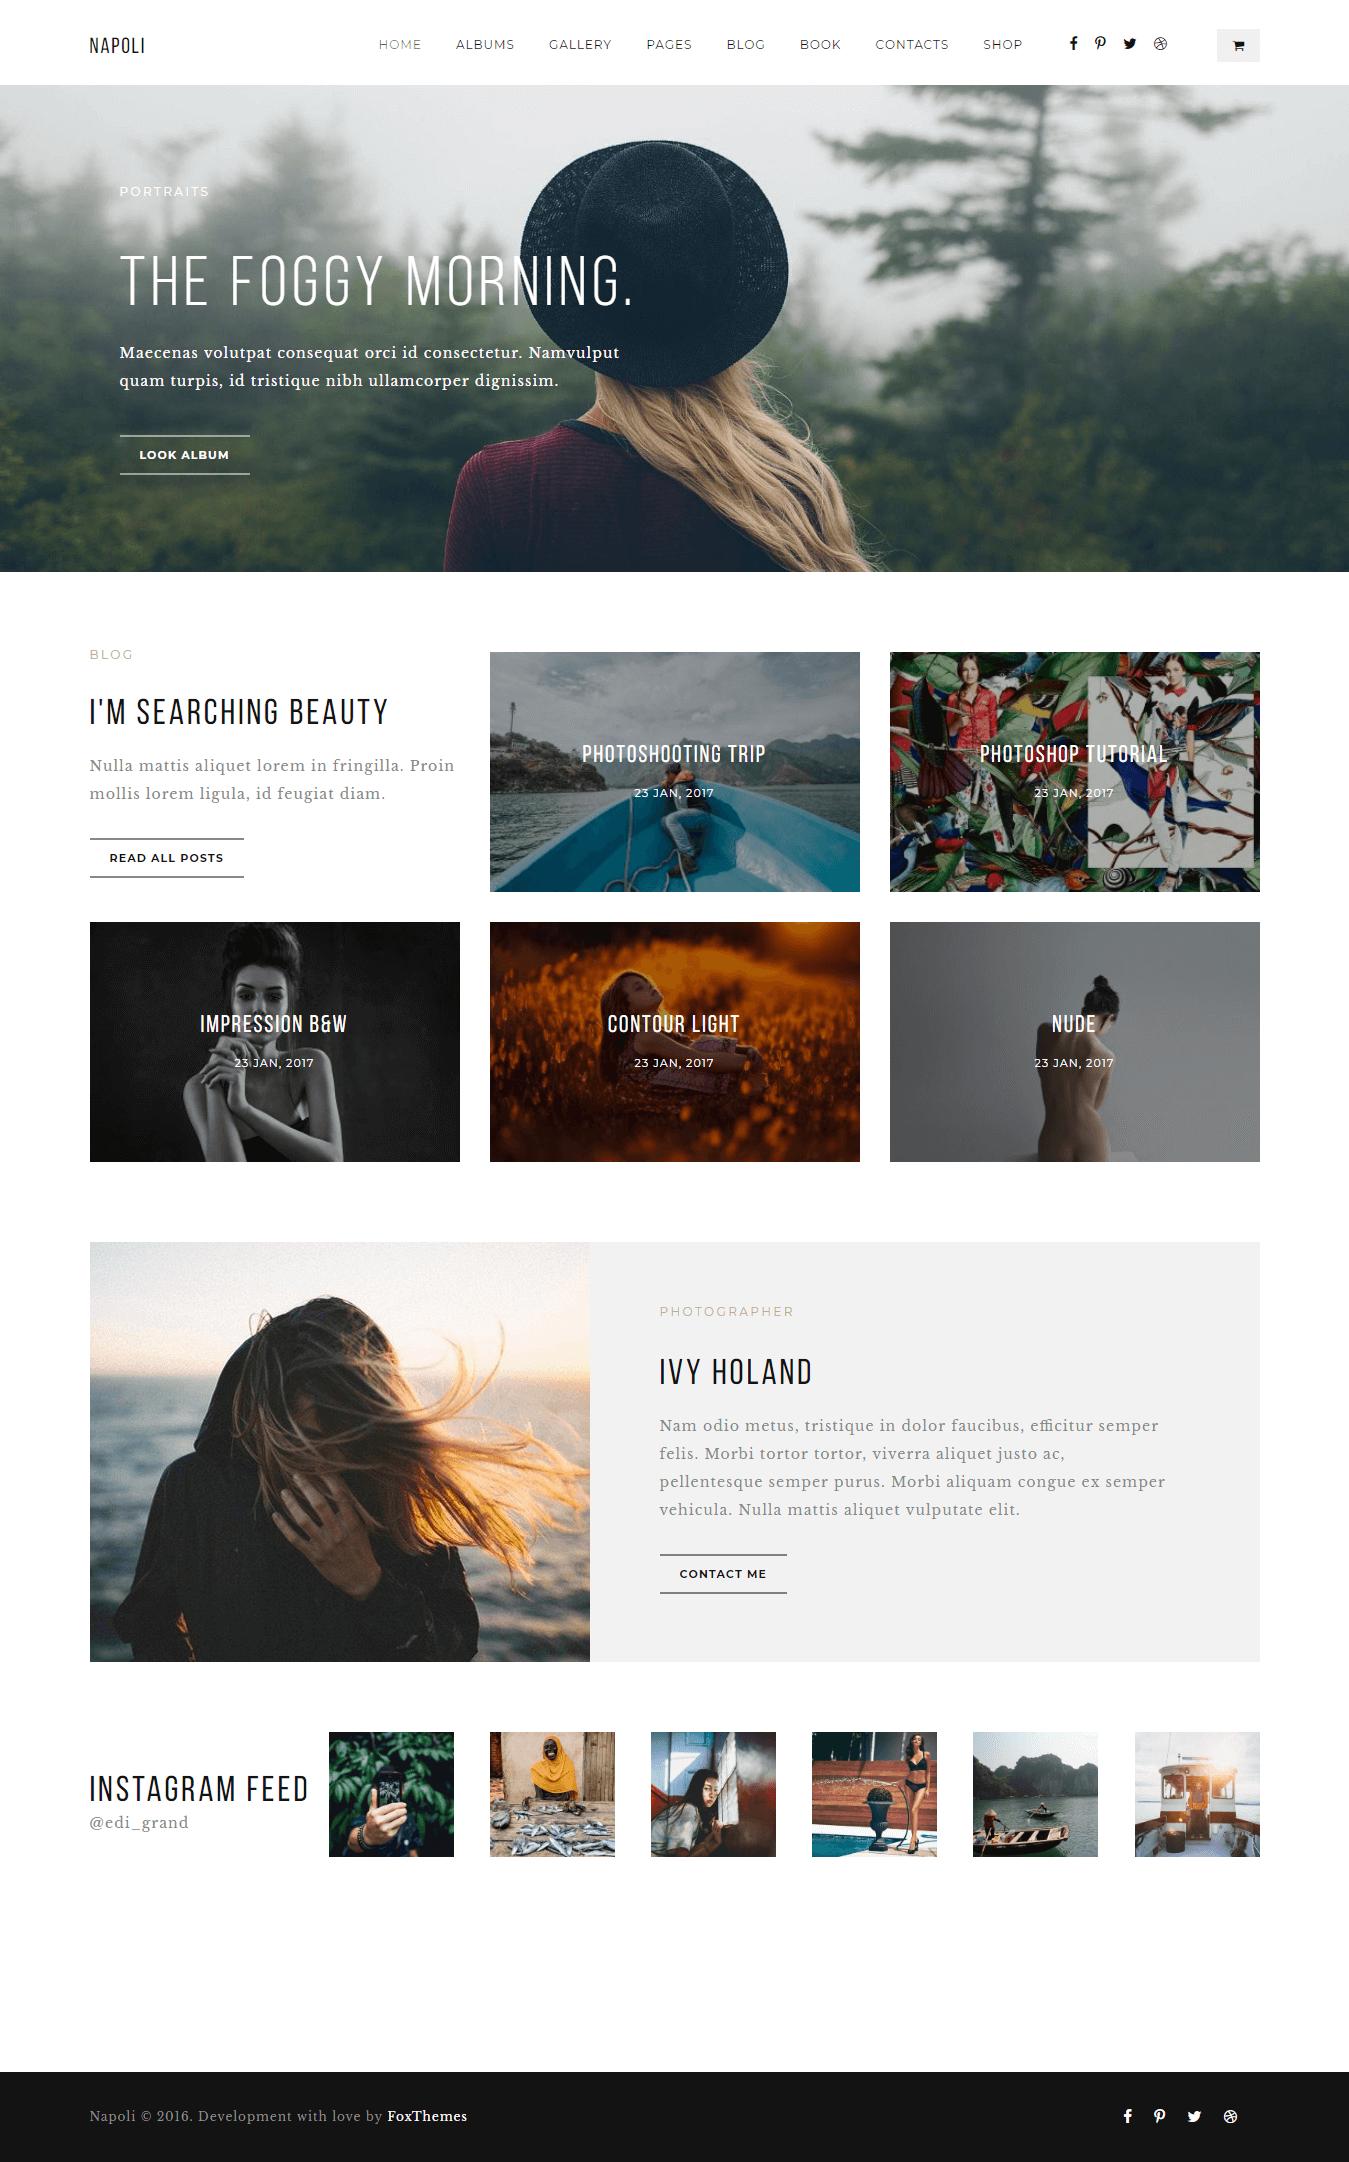 Napoli - Premium Photography WordPress Themes and Templates